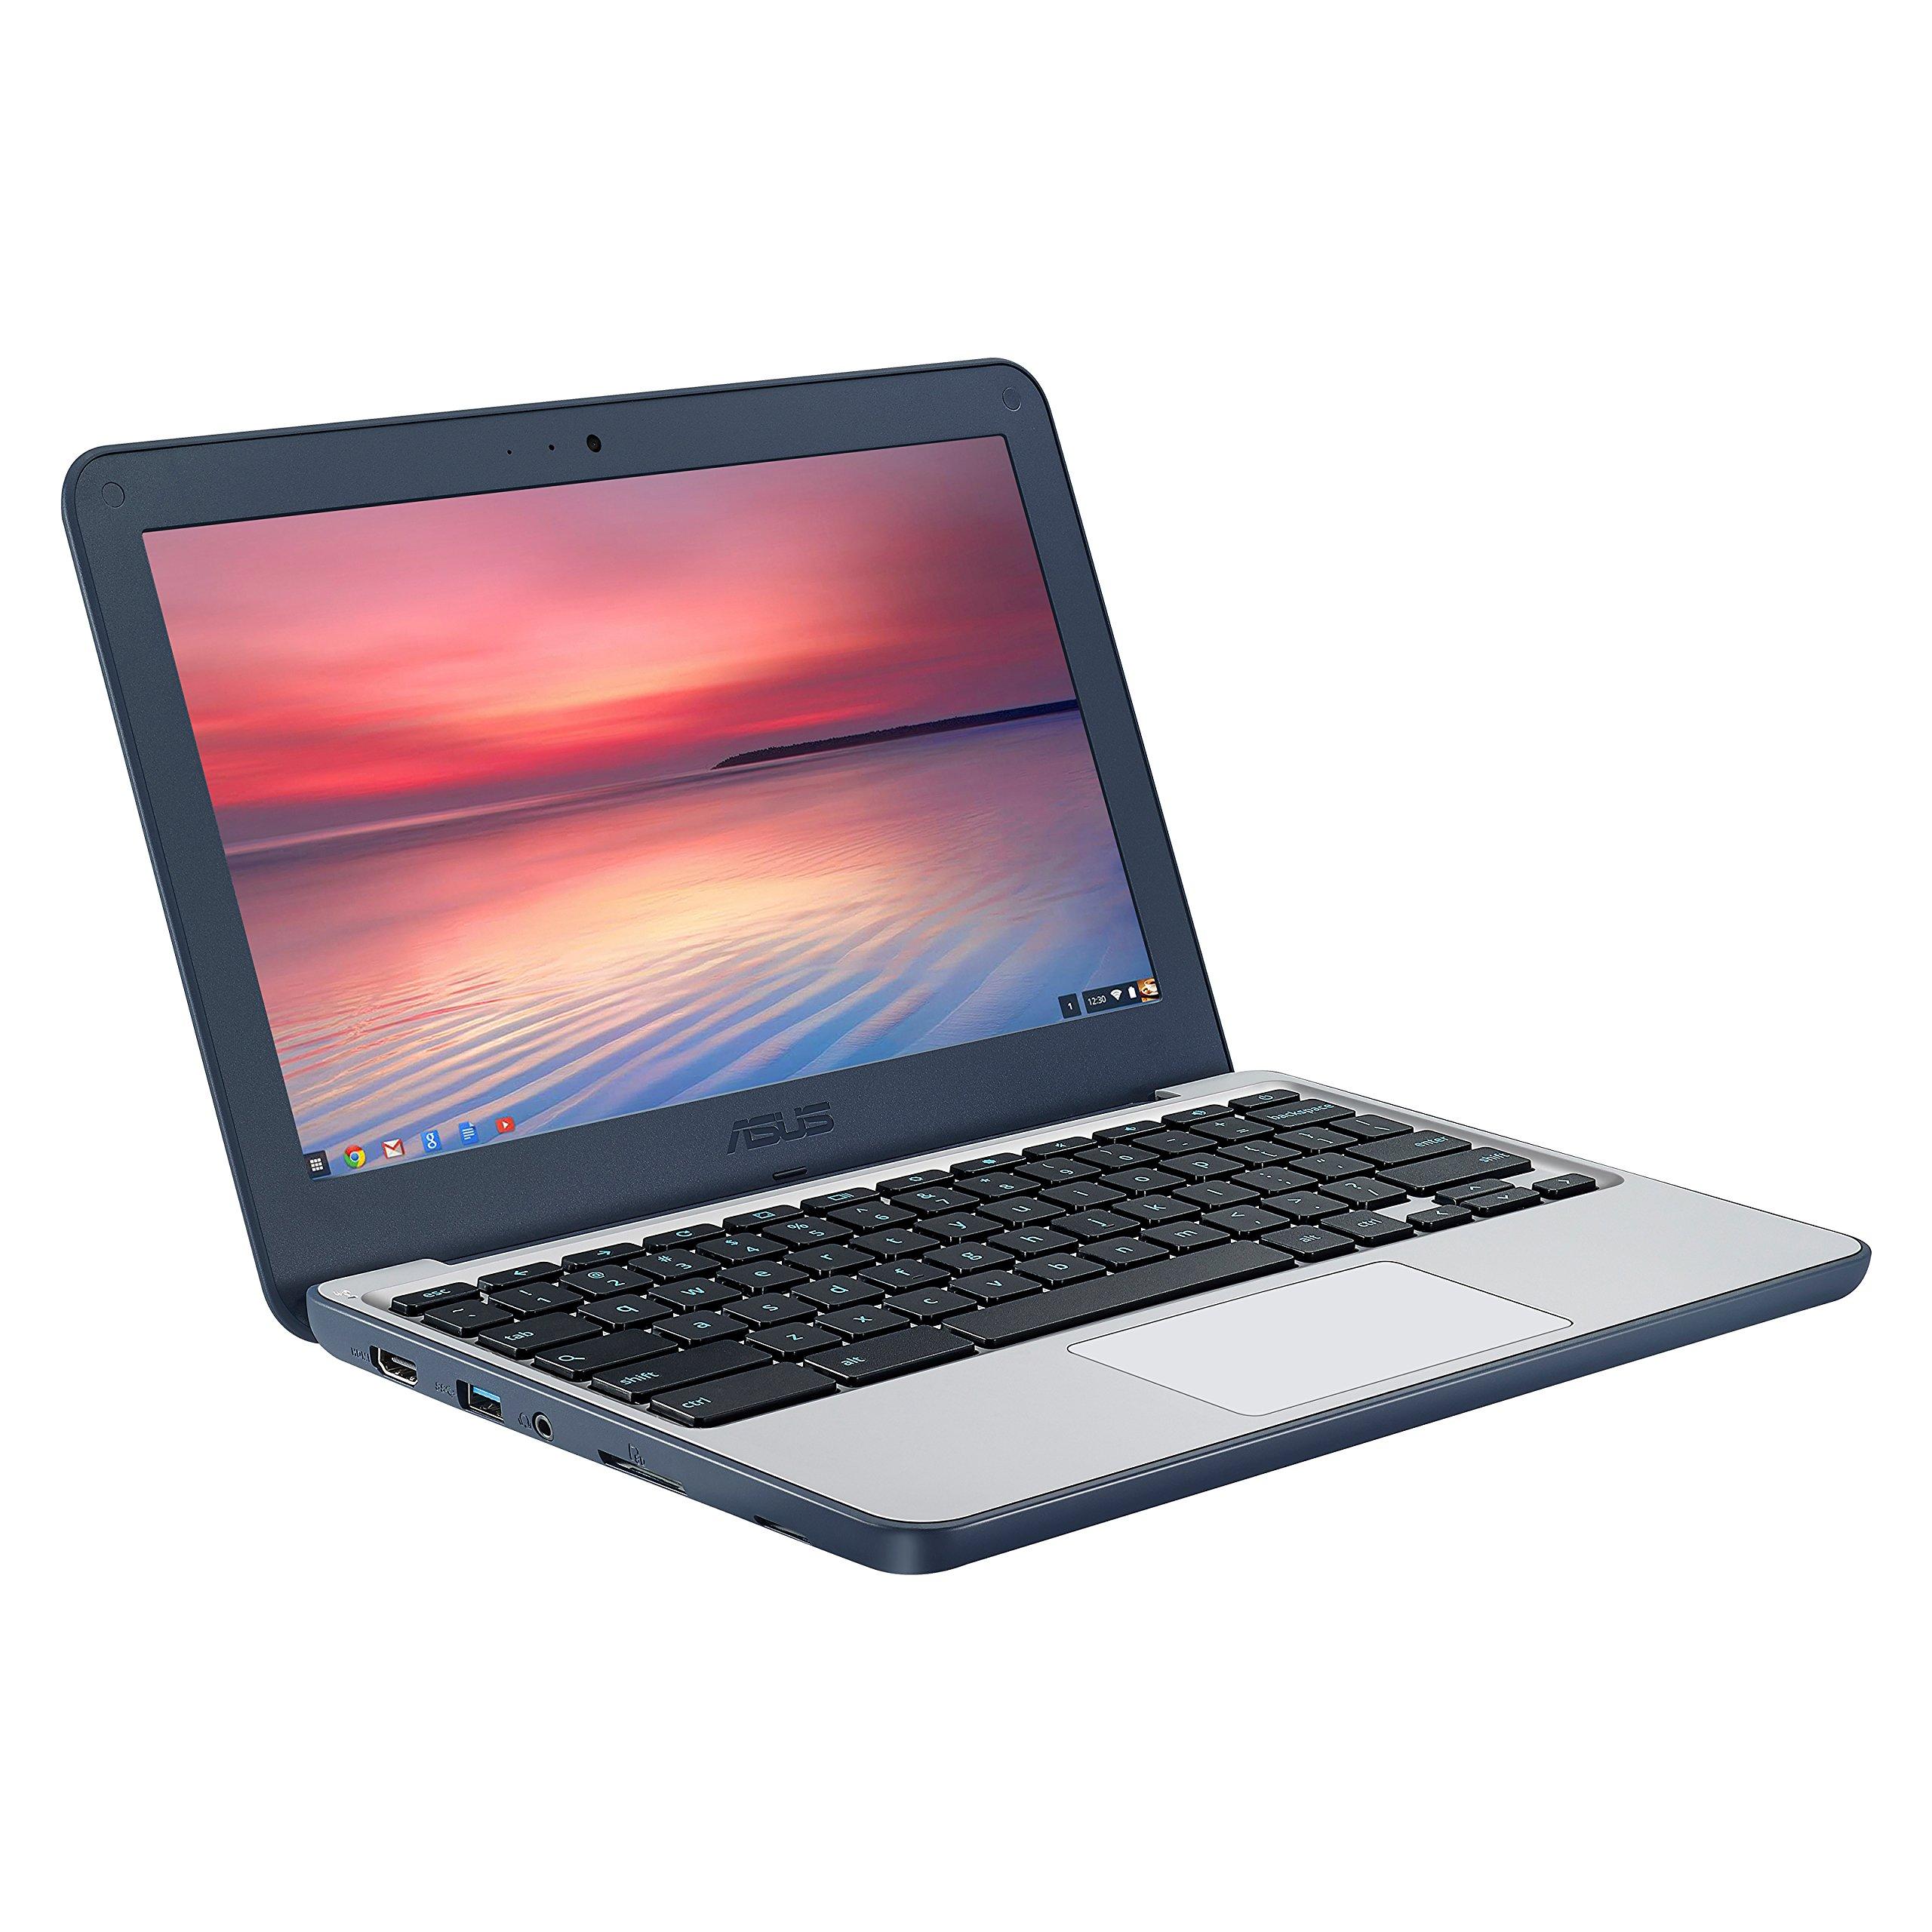 ASUS Chromebook C202SA-YS04 11.6'' Ruggedized and Water Resistant Design with 180 Degree Hinge (Intel Celeron 4GB RAM, 32GB eMMC, Dark Blue) and AmazonBasics 11.6-Inch Laptop Sleeve